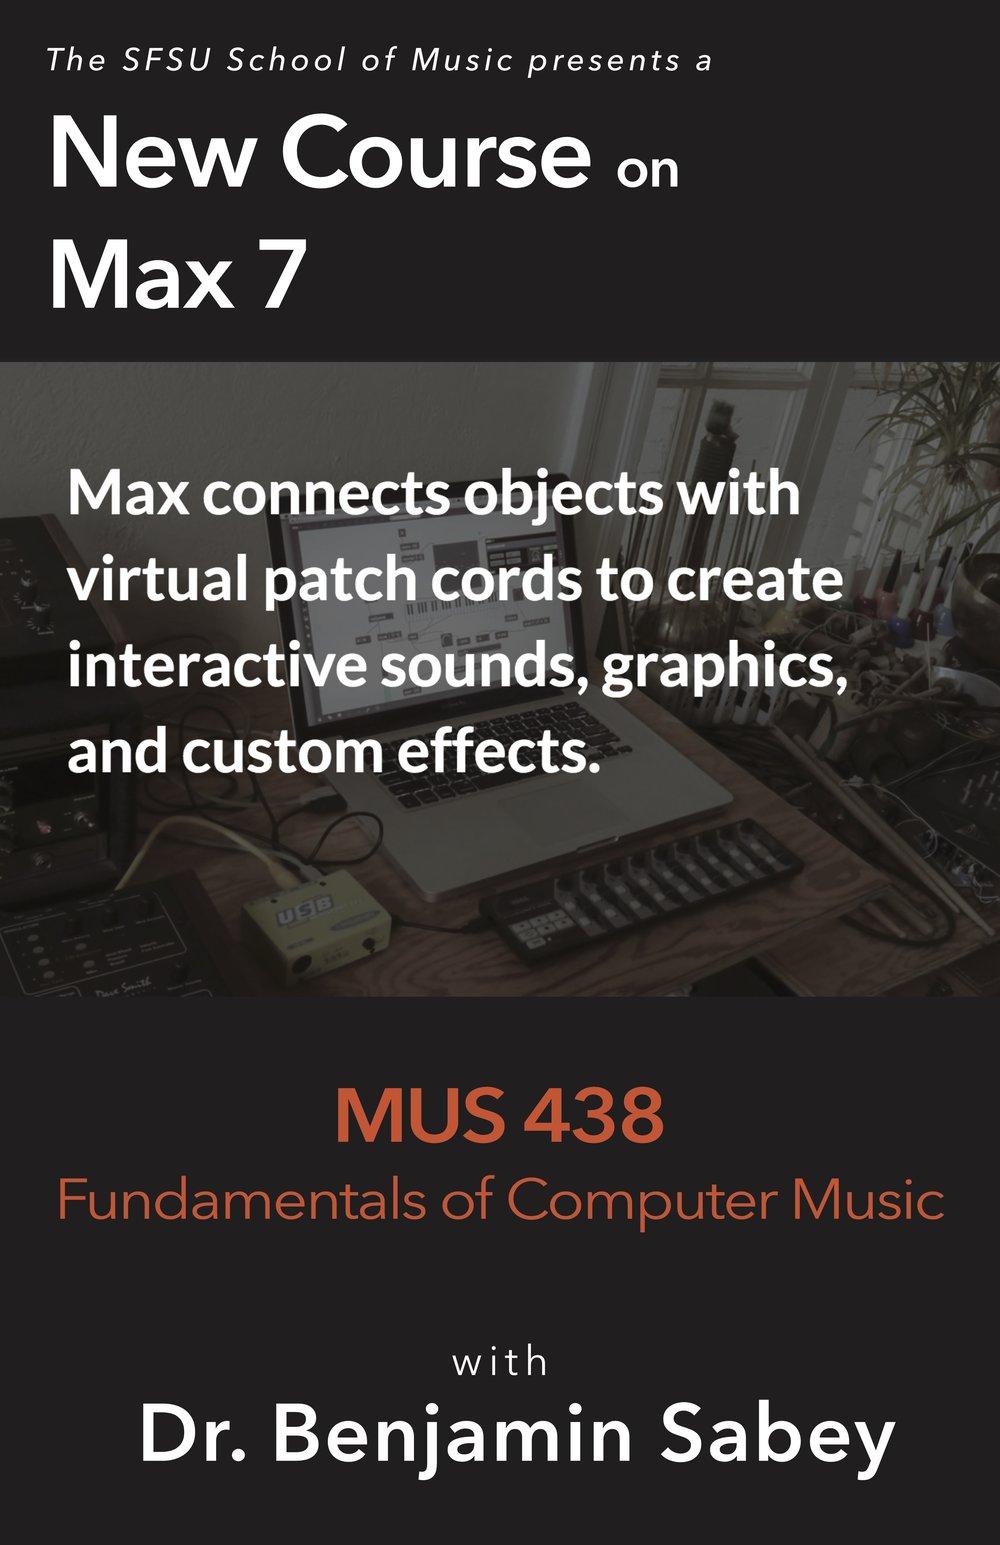 MUS 438 poster.jpg